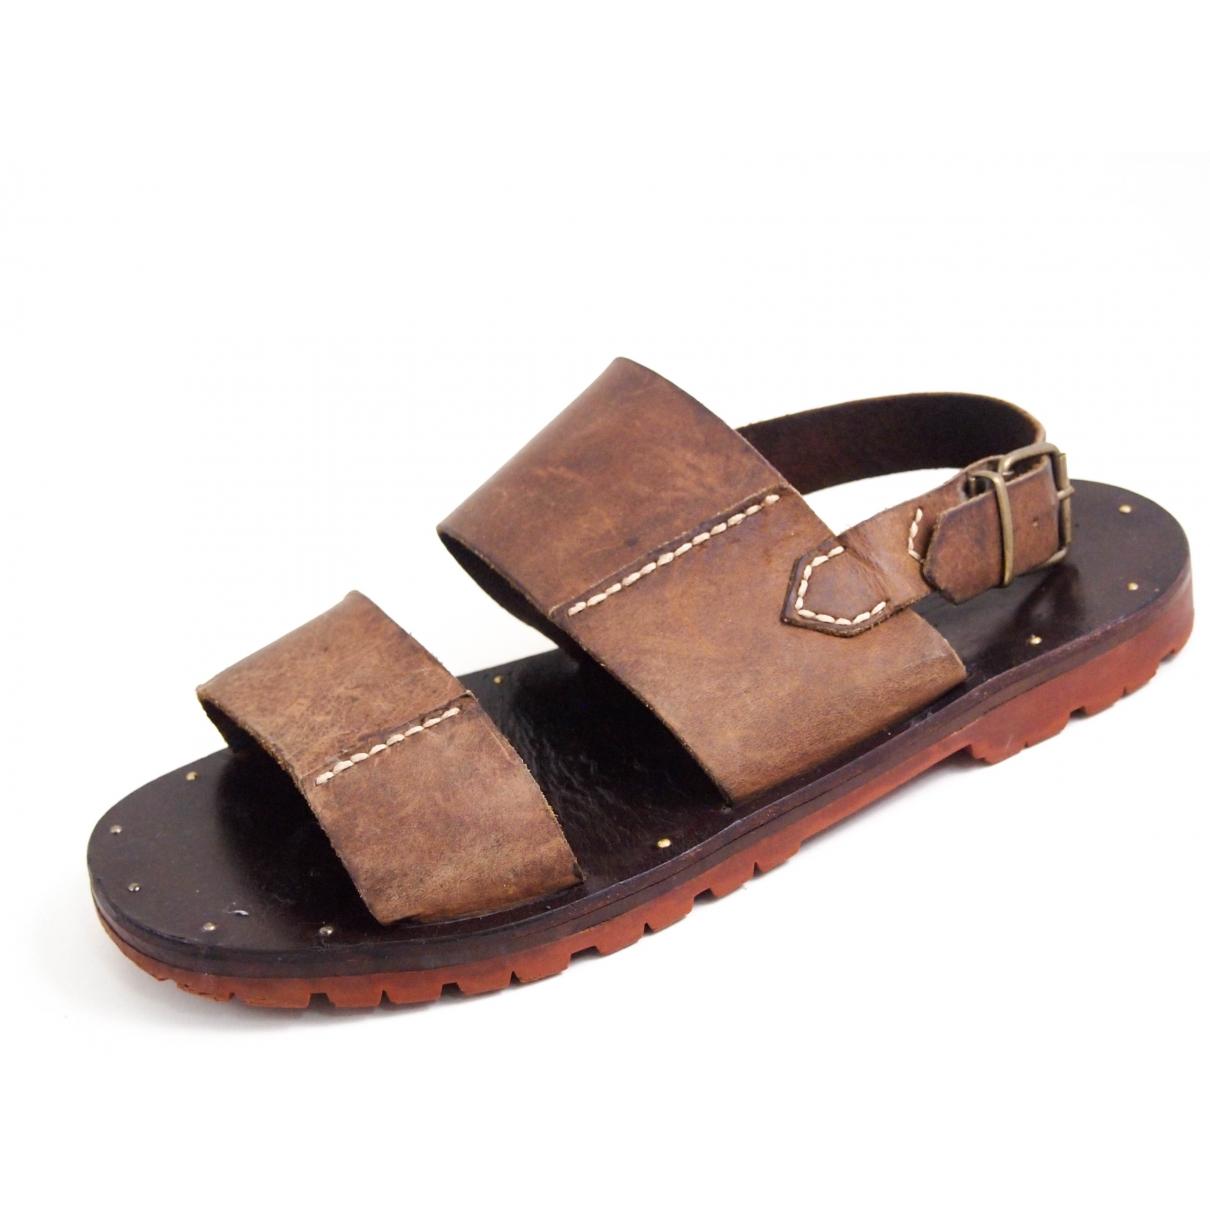 Sandalias de Cuero Polo Ralph Lauren